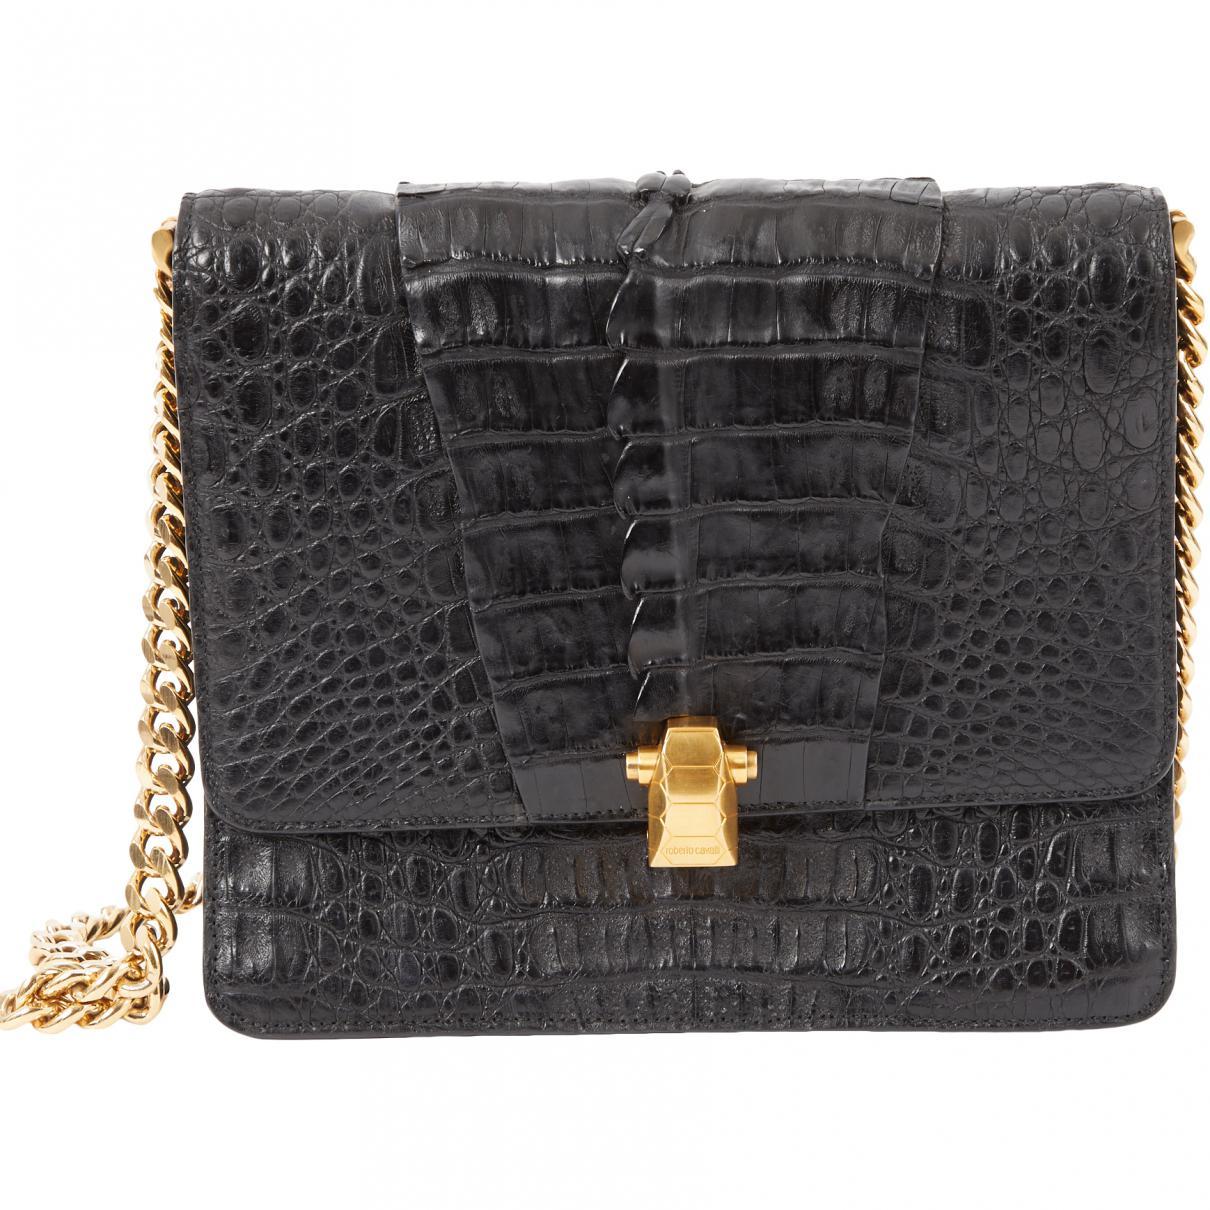 Roberto Cavalli Pre-owned - Leather bag PJrGv